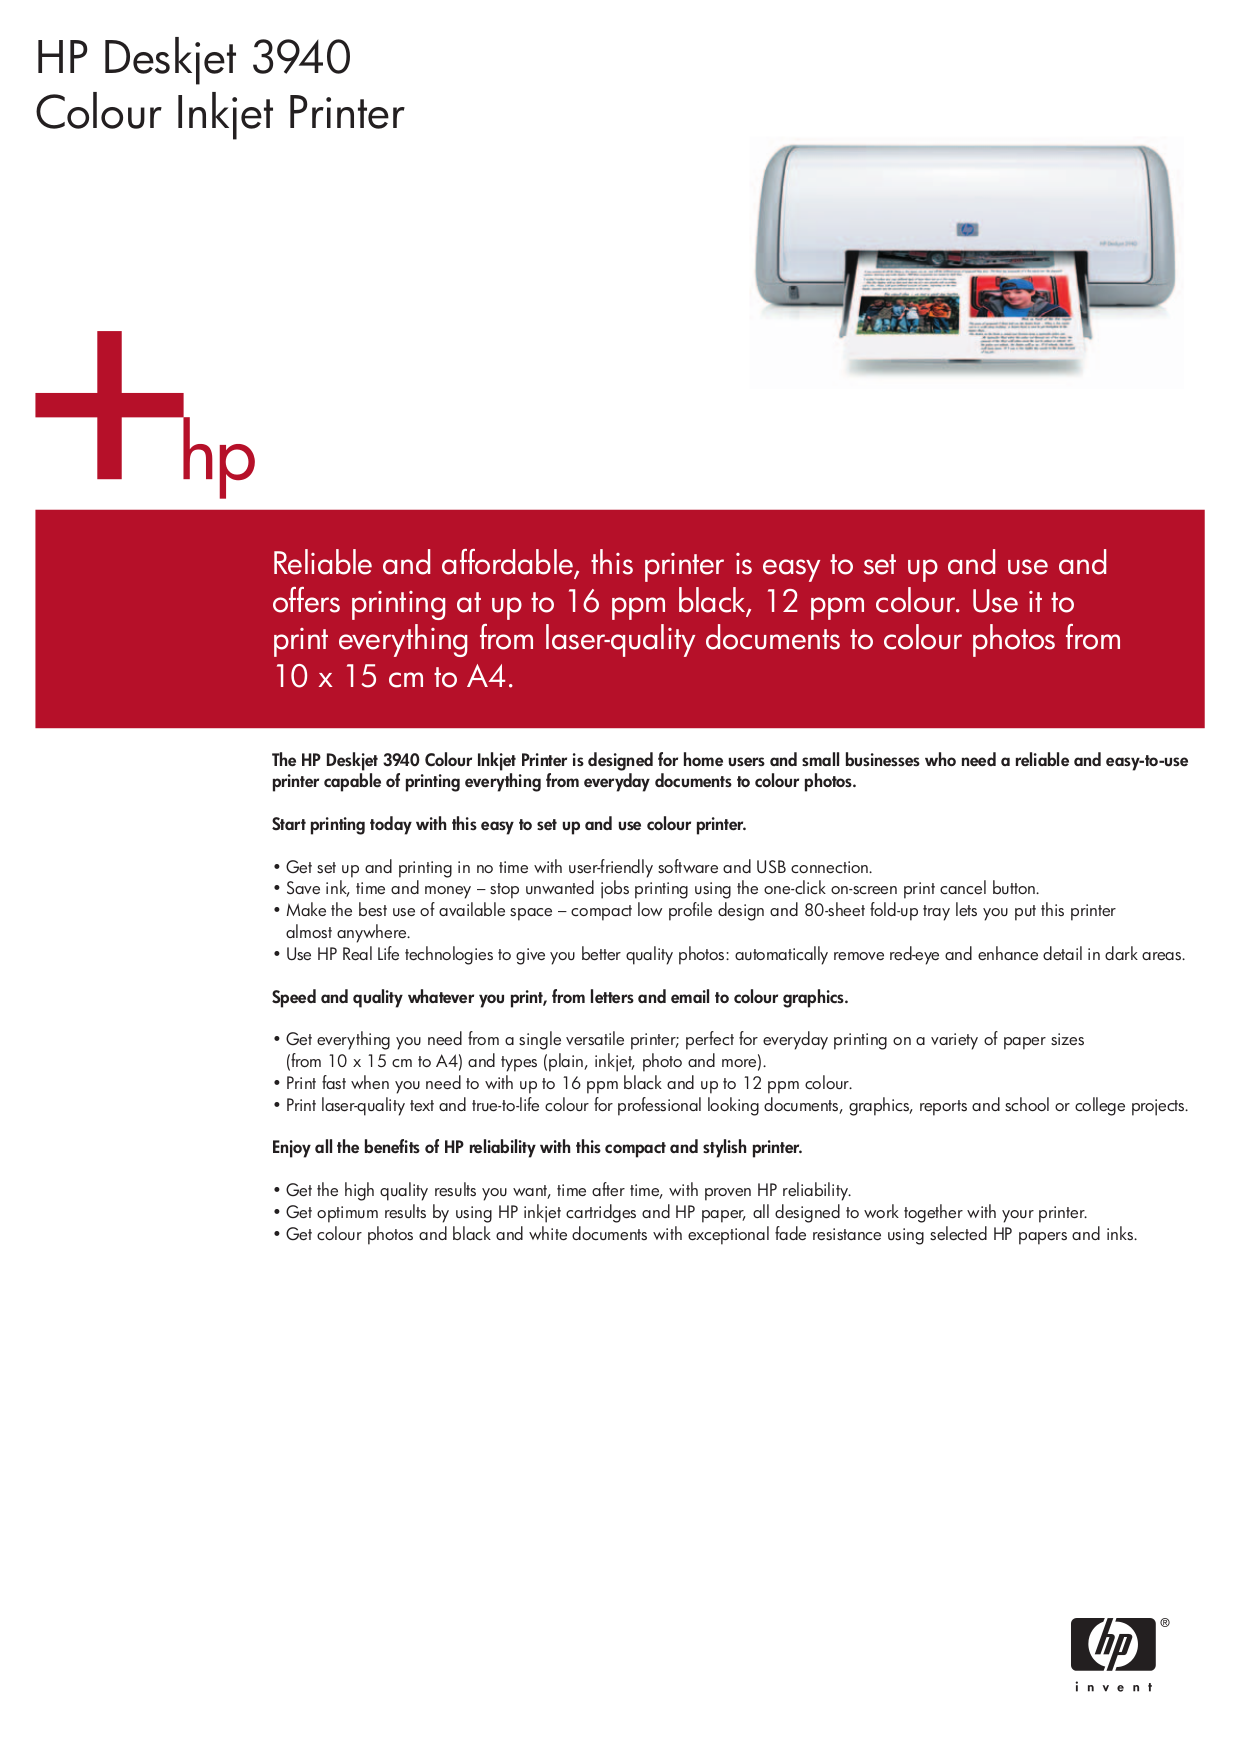 download free pdf for hp deskjet 3940 printer manual rh umlib com HP Deskjet 3940 Windows 8 HP Deskjet 3940 Windows 8